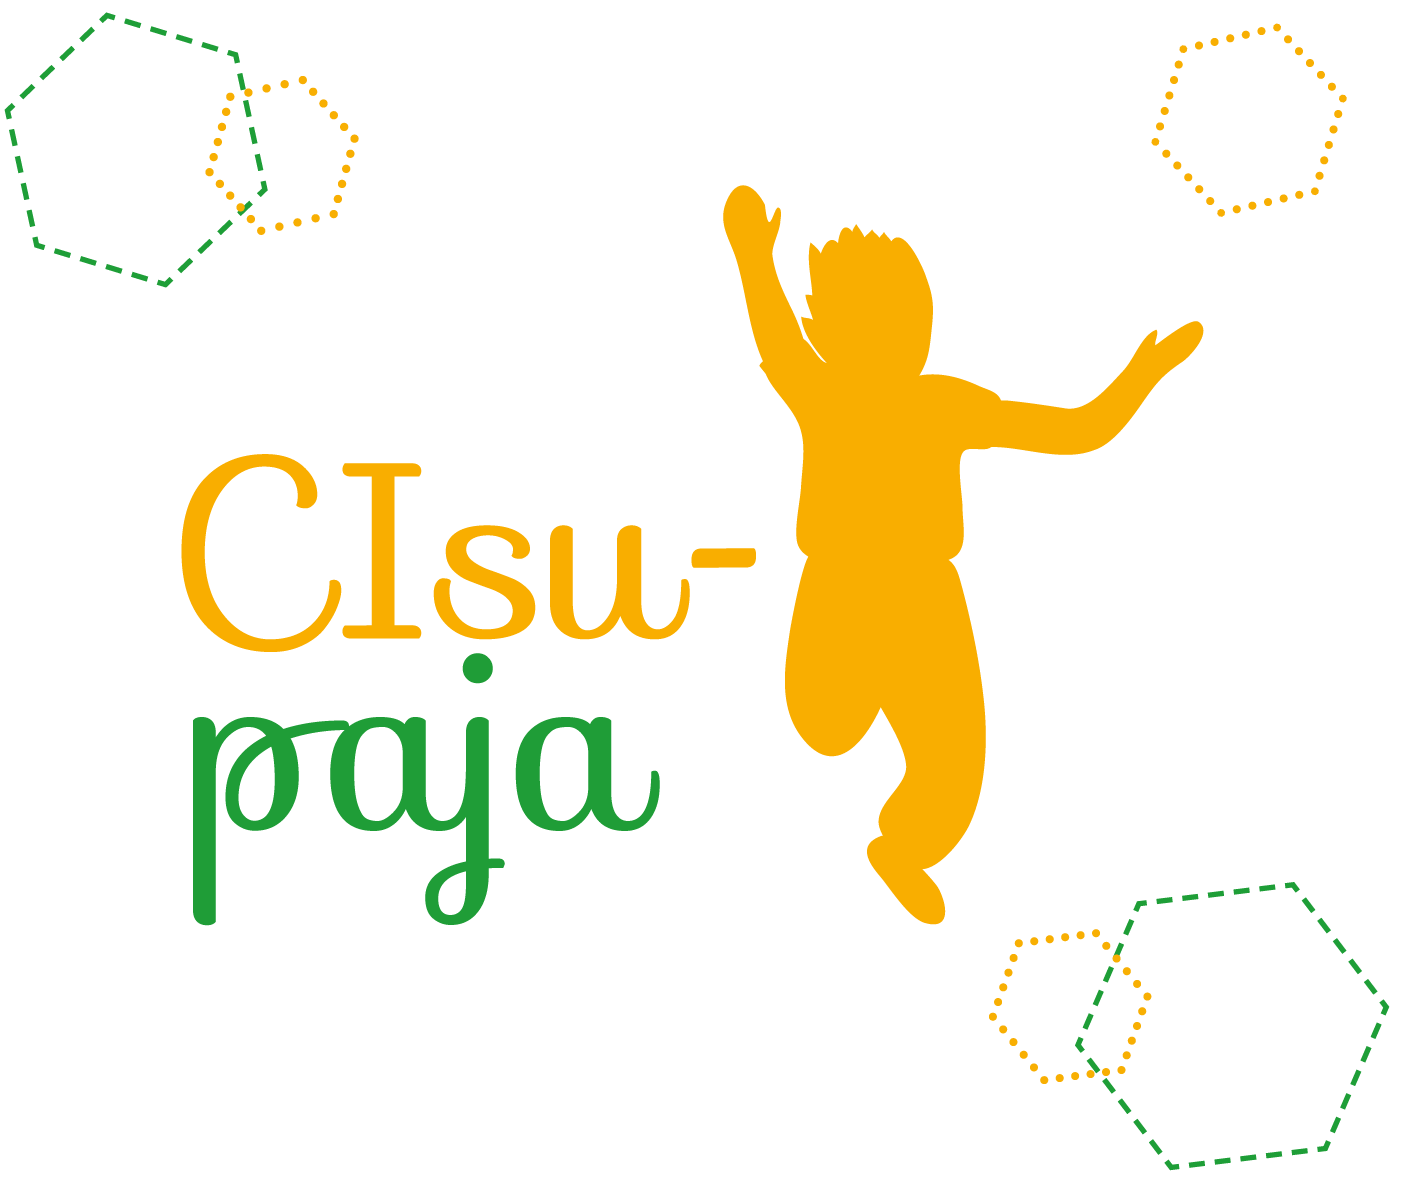 CIsupaja-logo